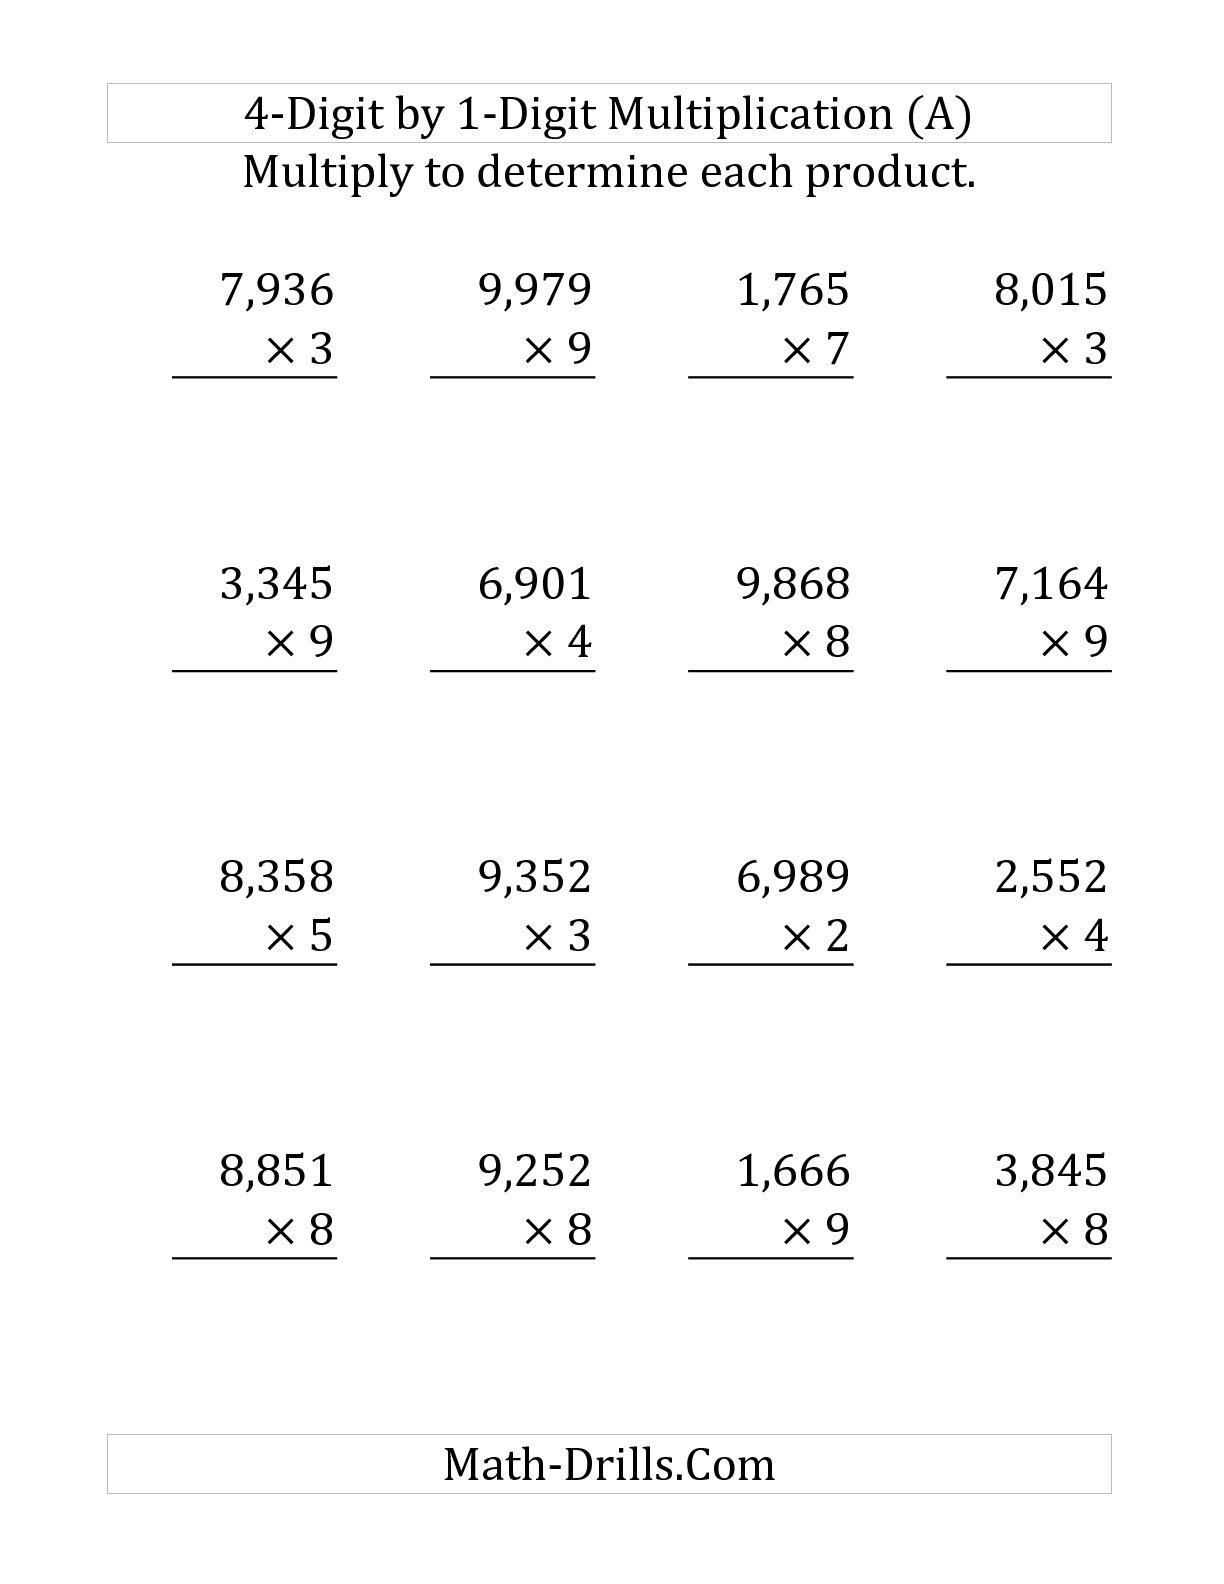 4 digit by 1 digit multiplication worksheets_667524